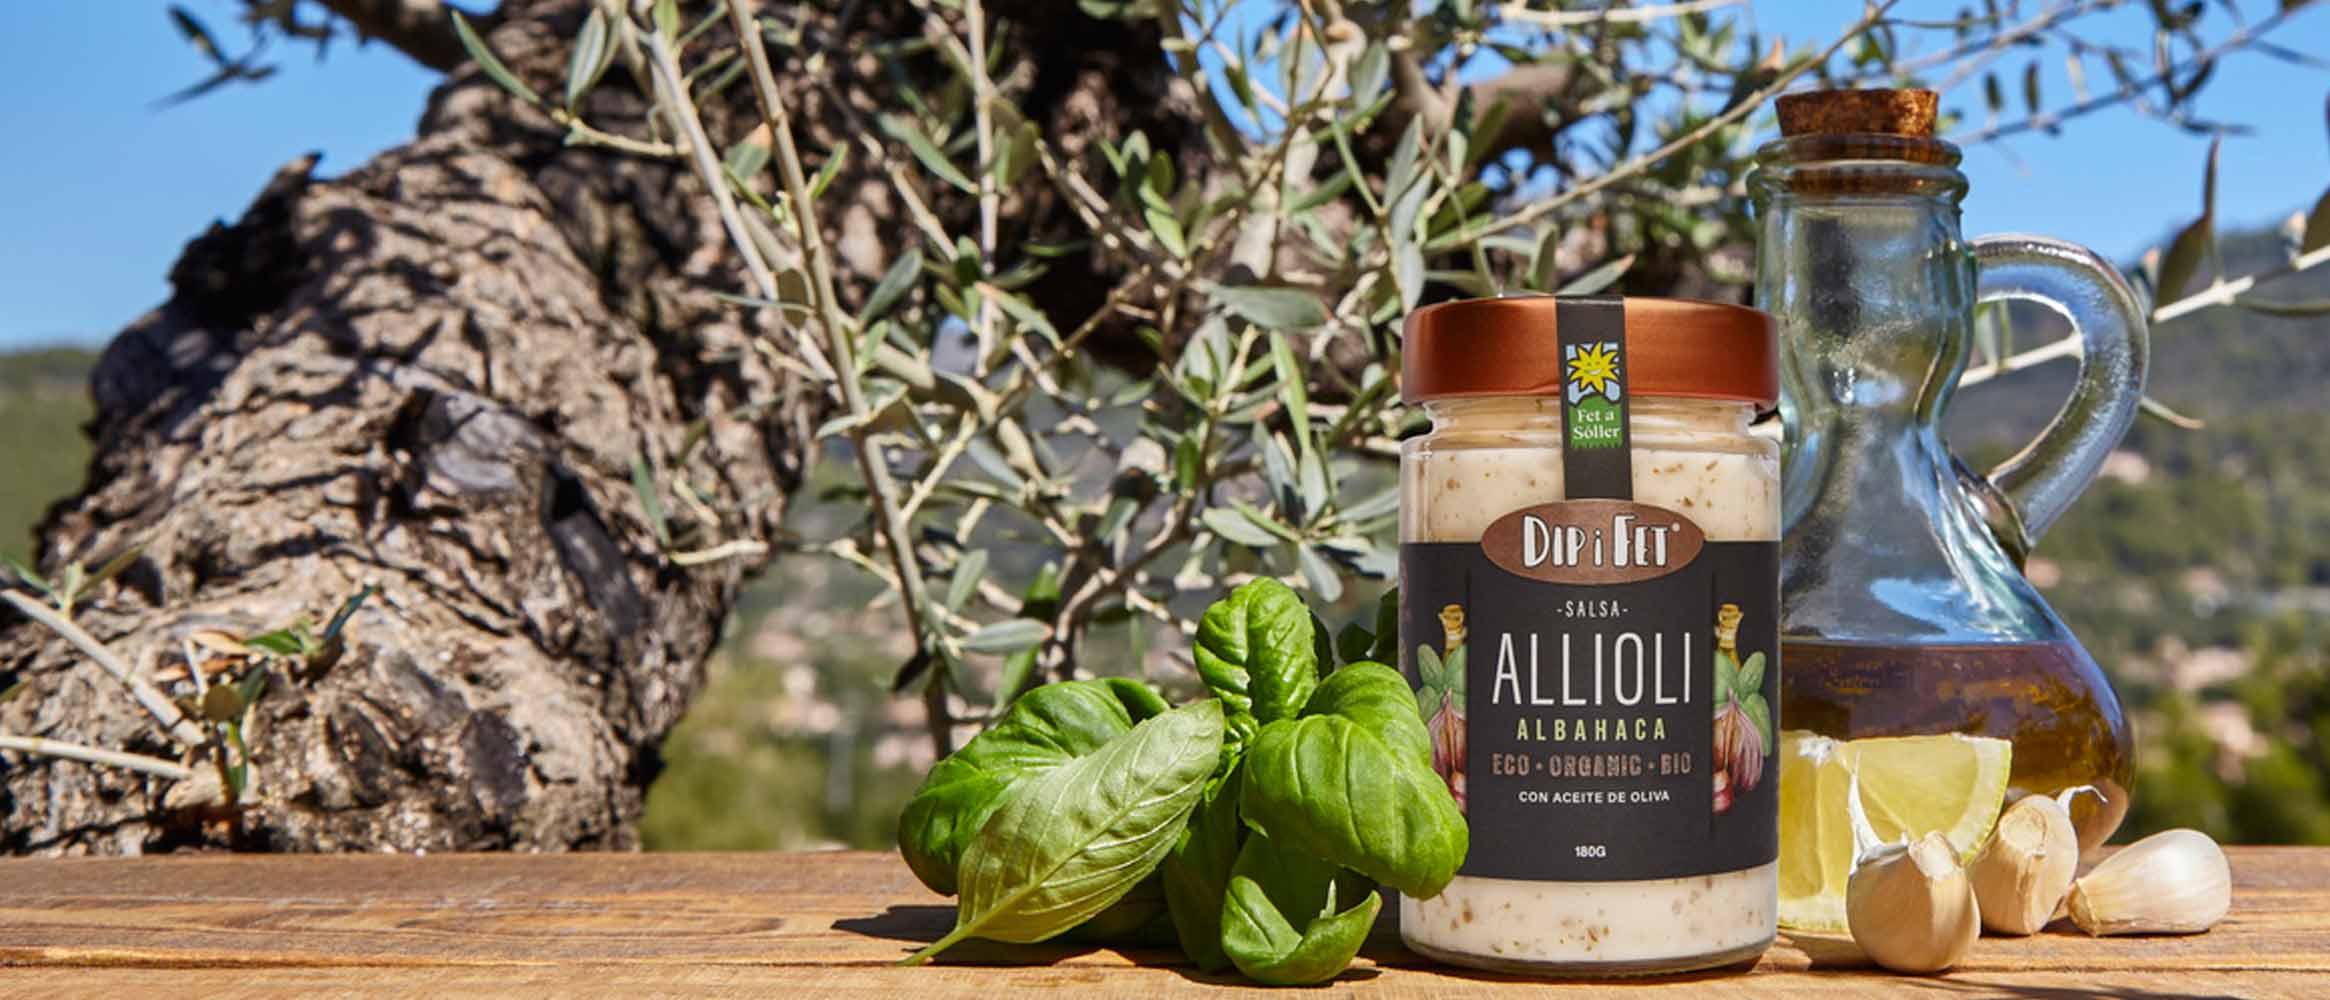 Salsa ALLIOLI albahaca DIP I FET BIO, 180G